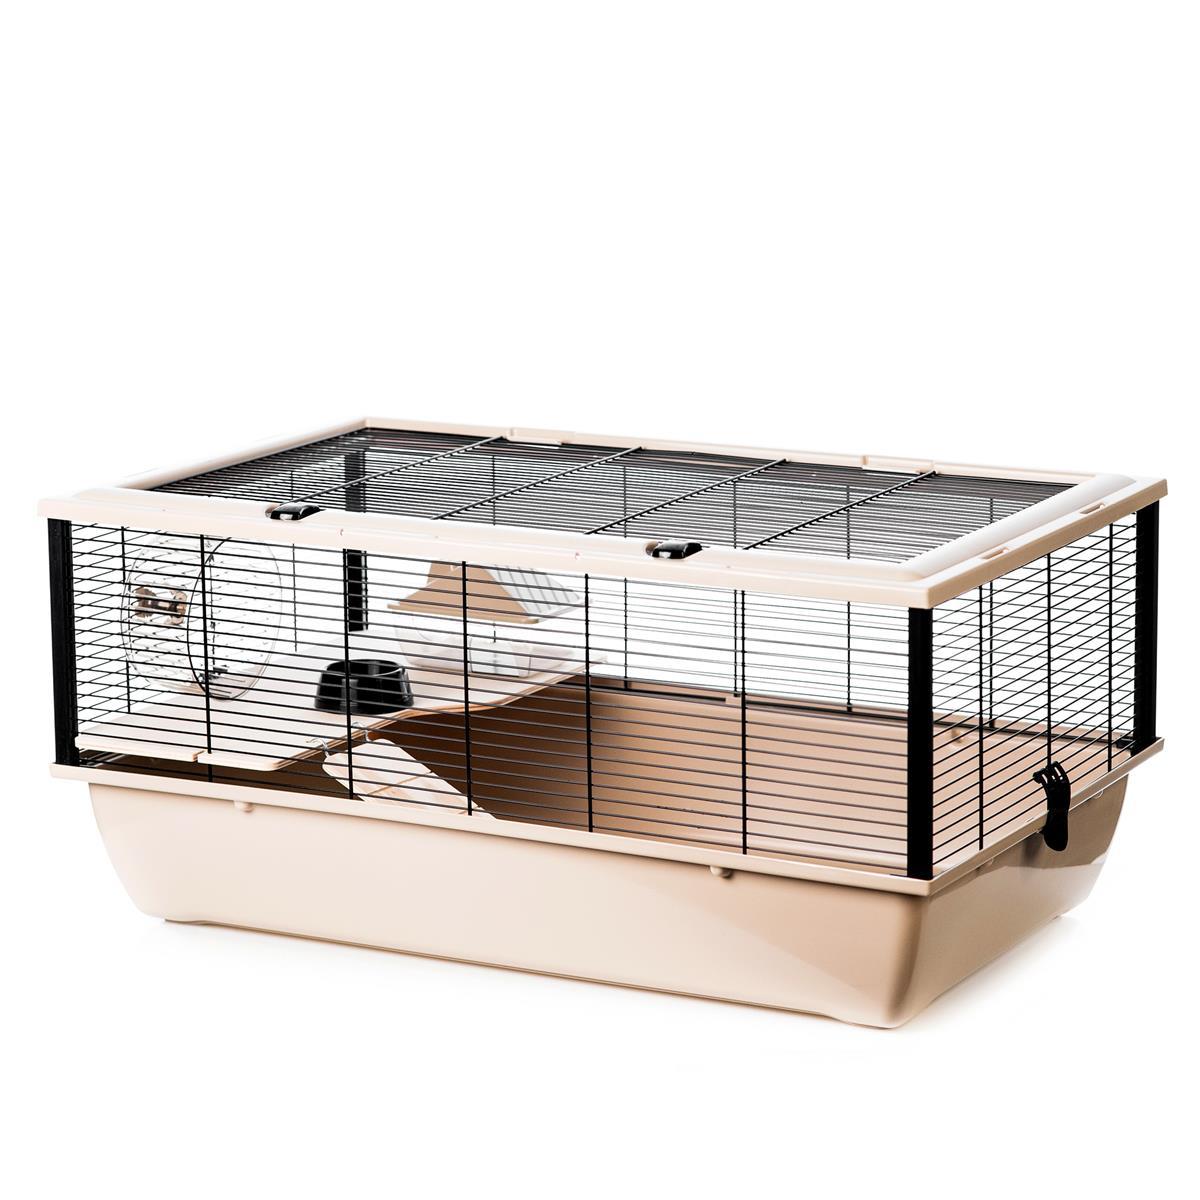 Hamsterbur BOB 78x48x36 cm